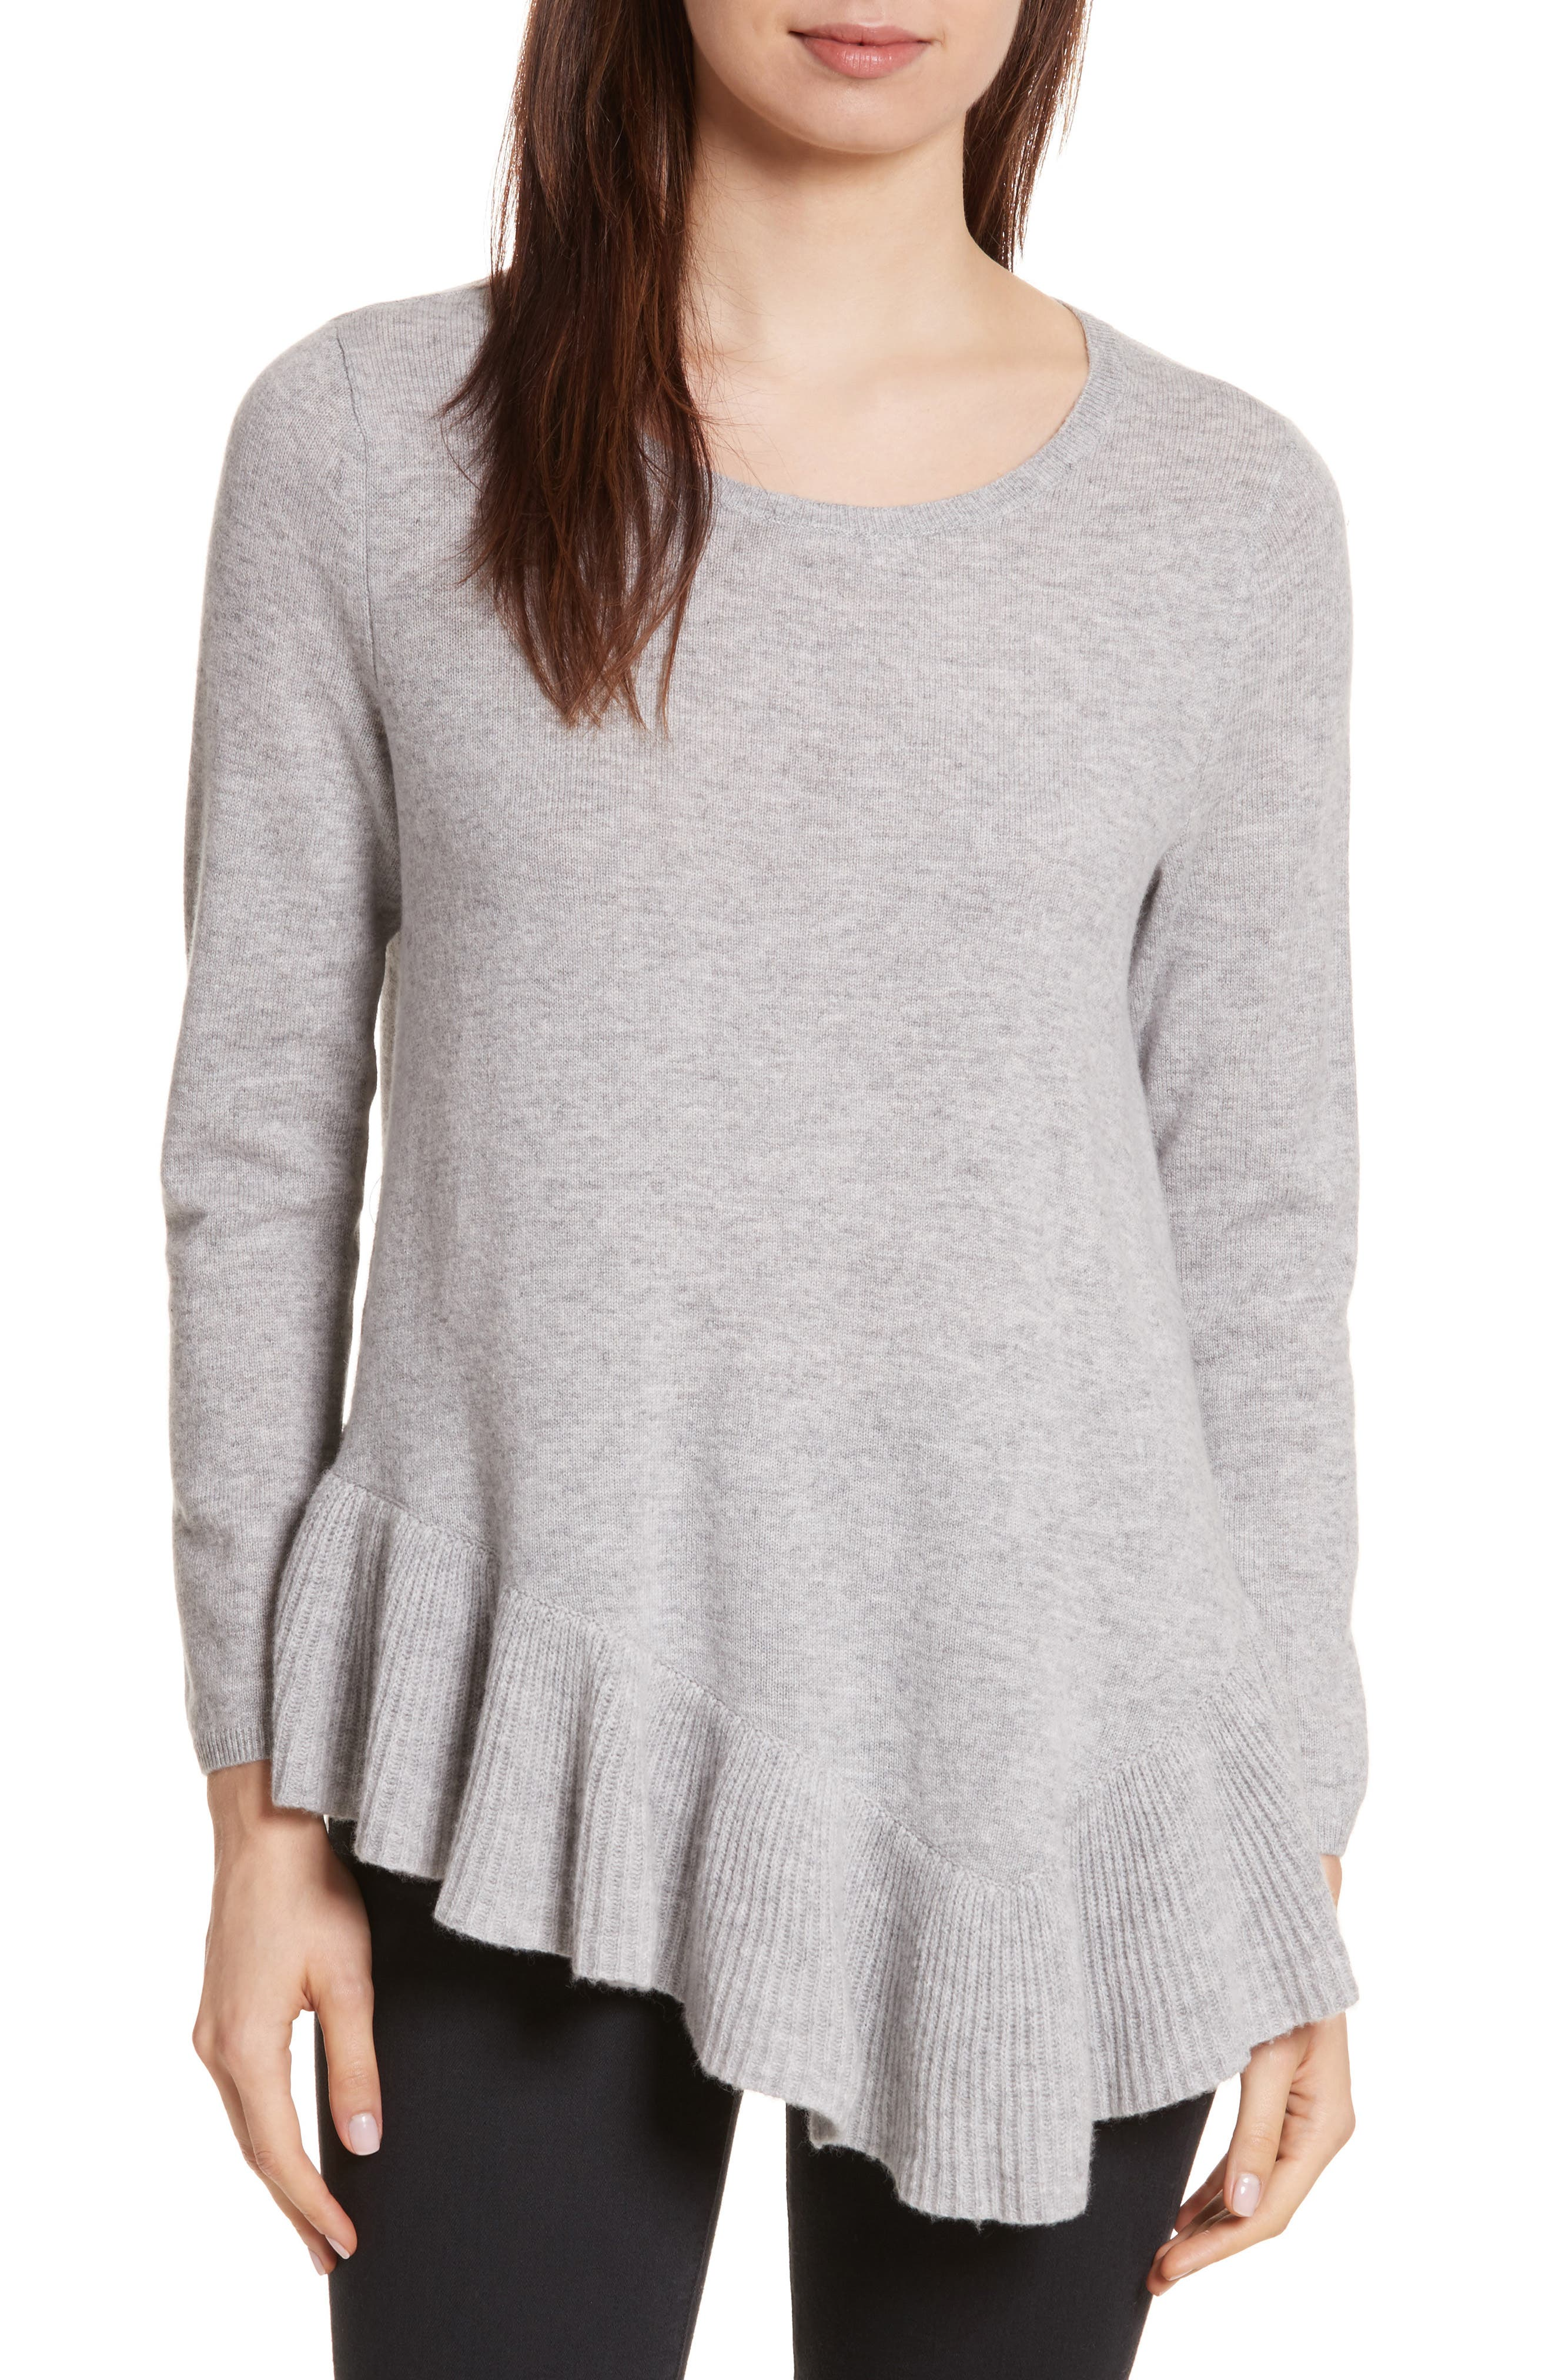 Tambrel N Wool & Cashmere Asymmetrical Sweater Tunic,                         Main,                         color, Ash Heather Grey